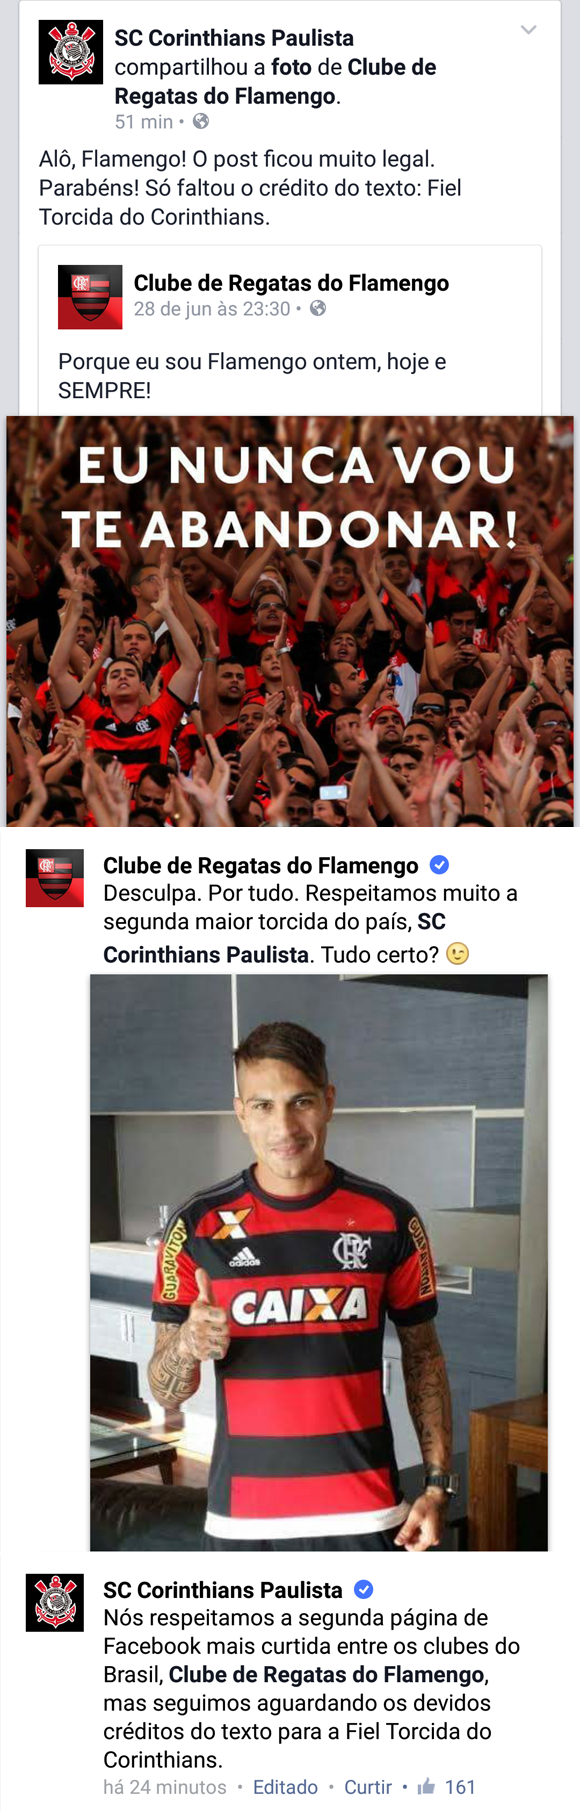 Flamengo e Corinthians trocaram farpas no Facebook 21fc89b1ed4e5